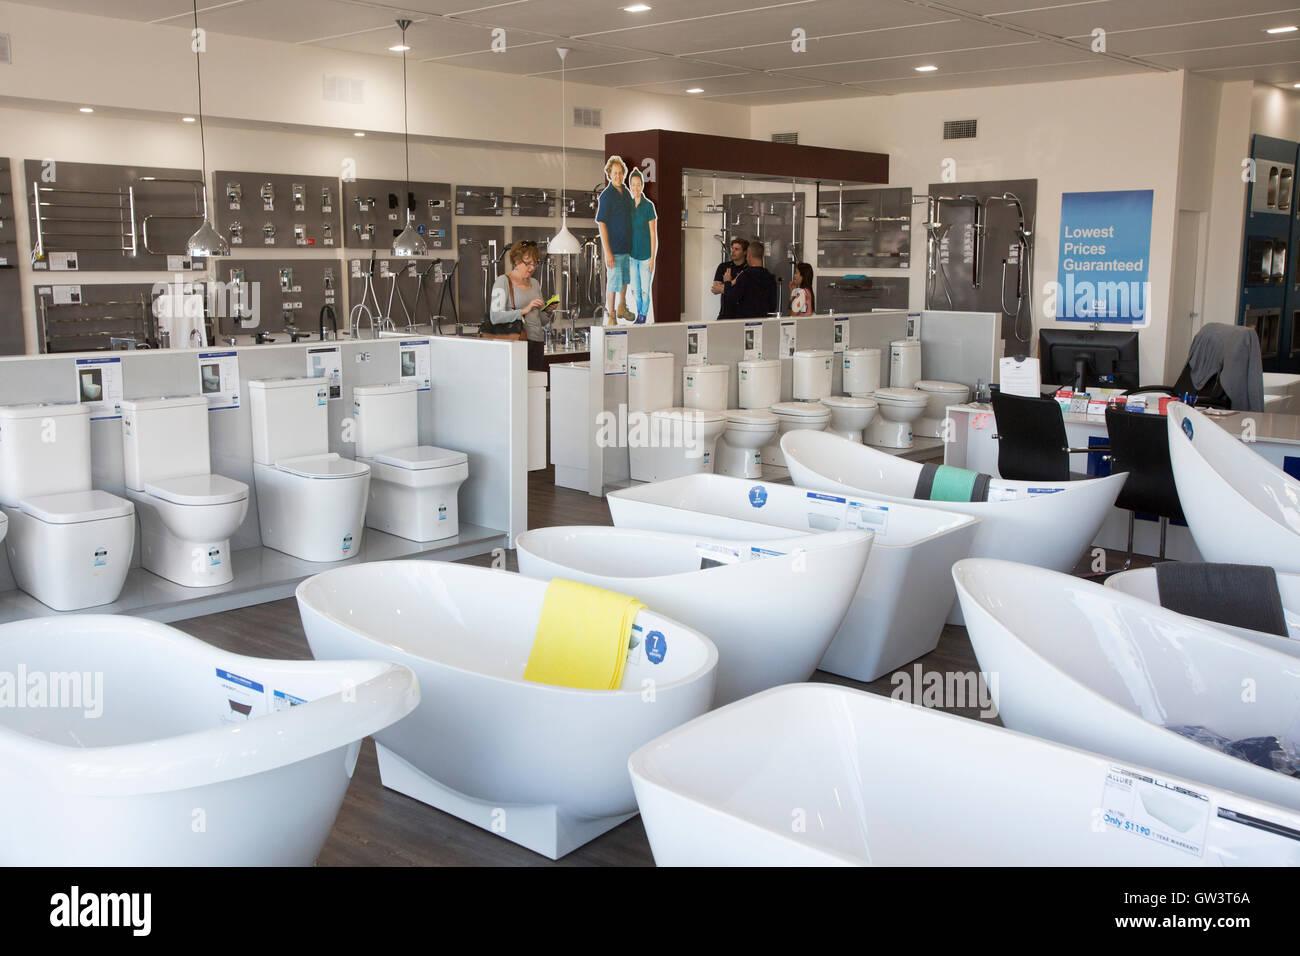 Bathroom Sanitary Ware Showroom Retailer Stock Photos & Bathroom ...